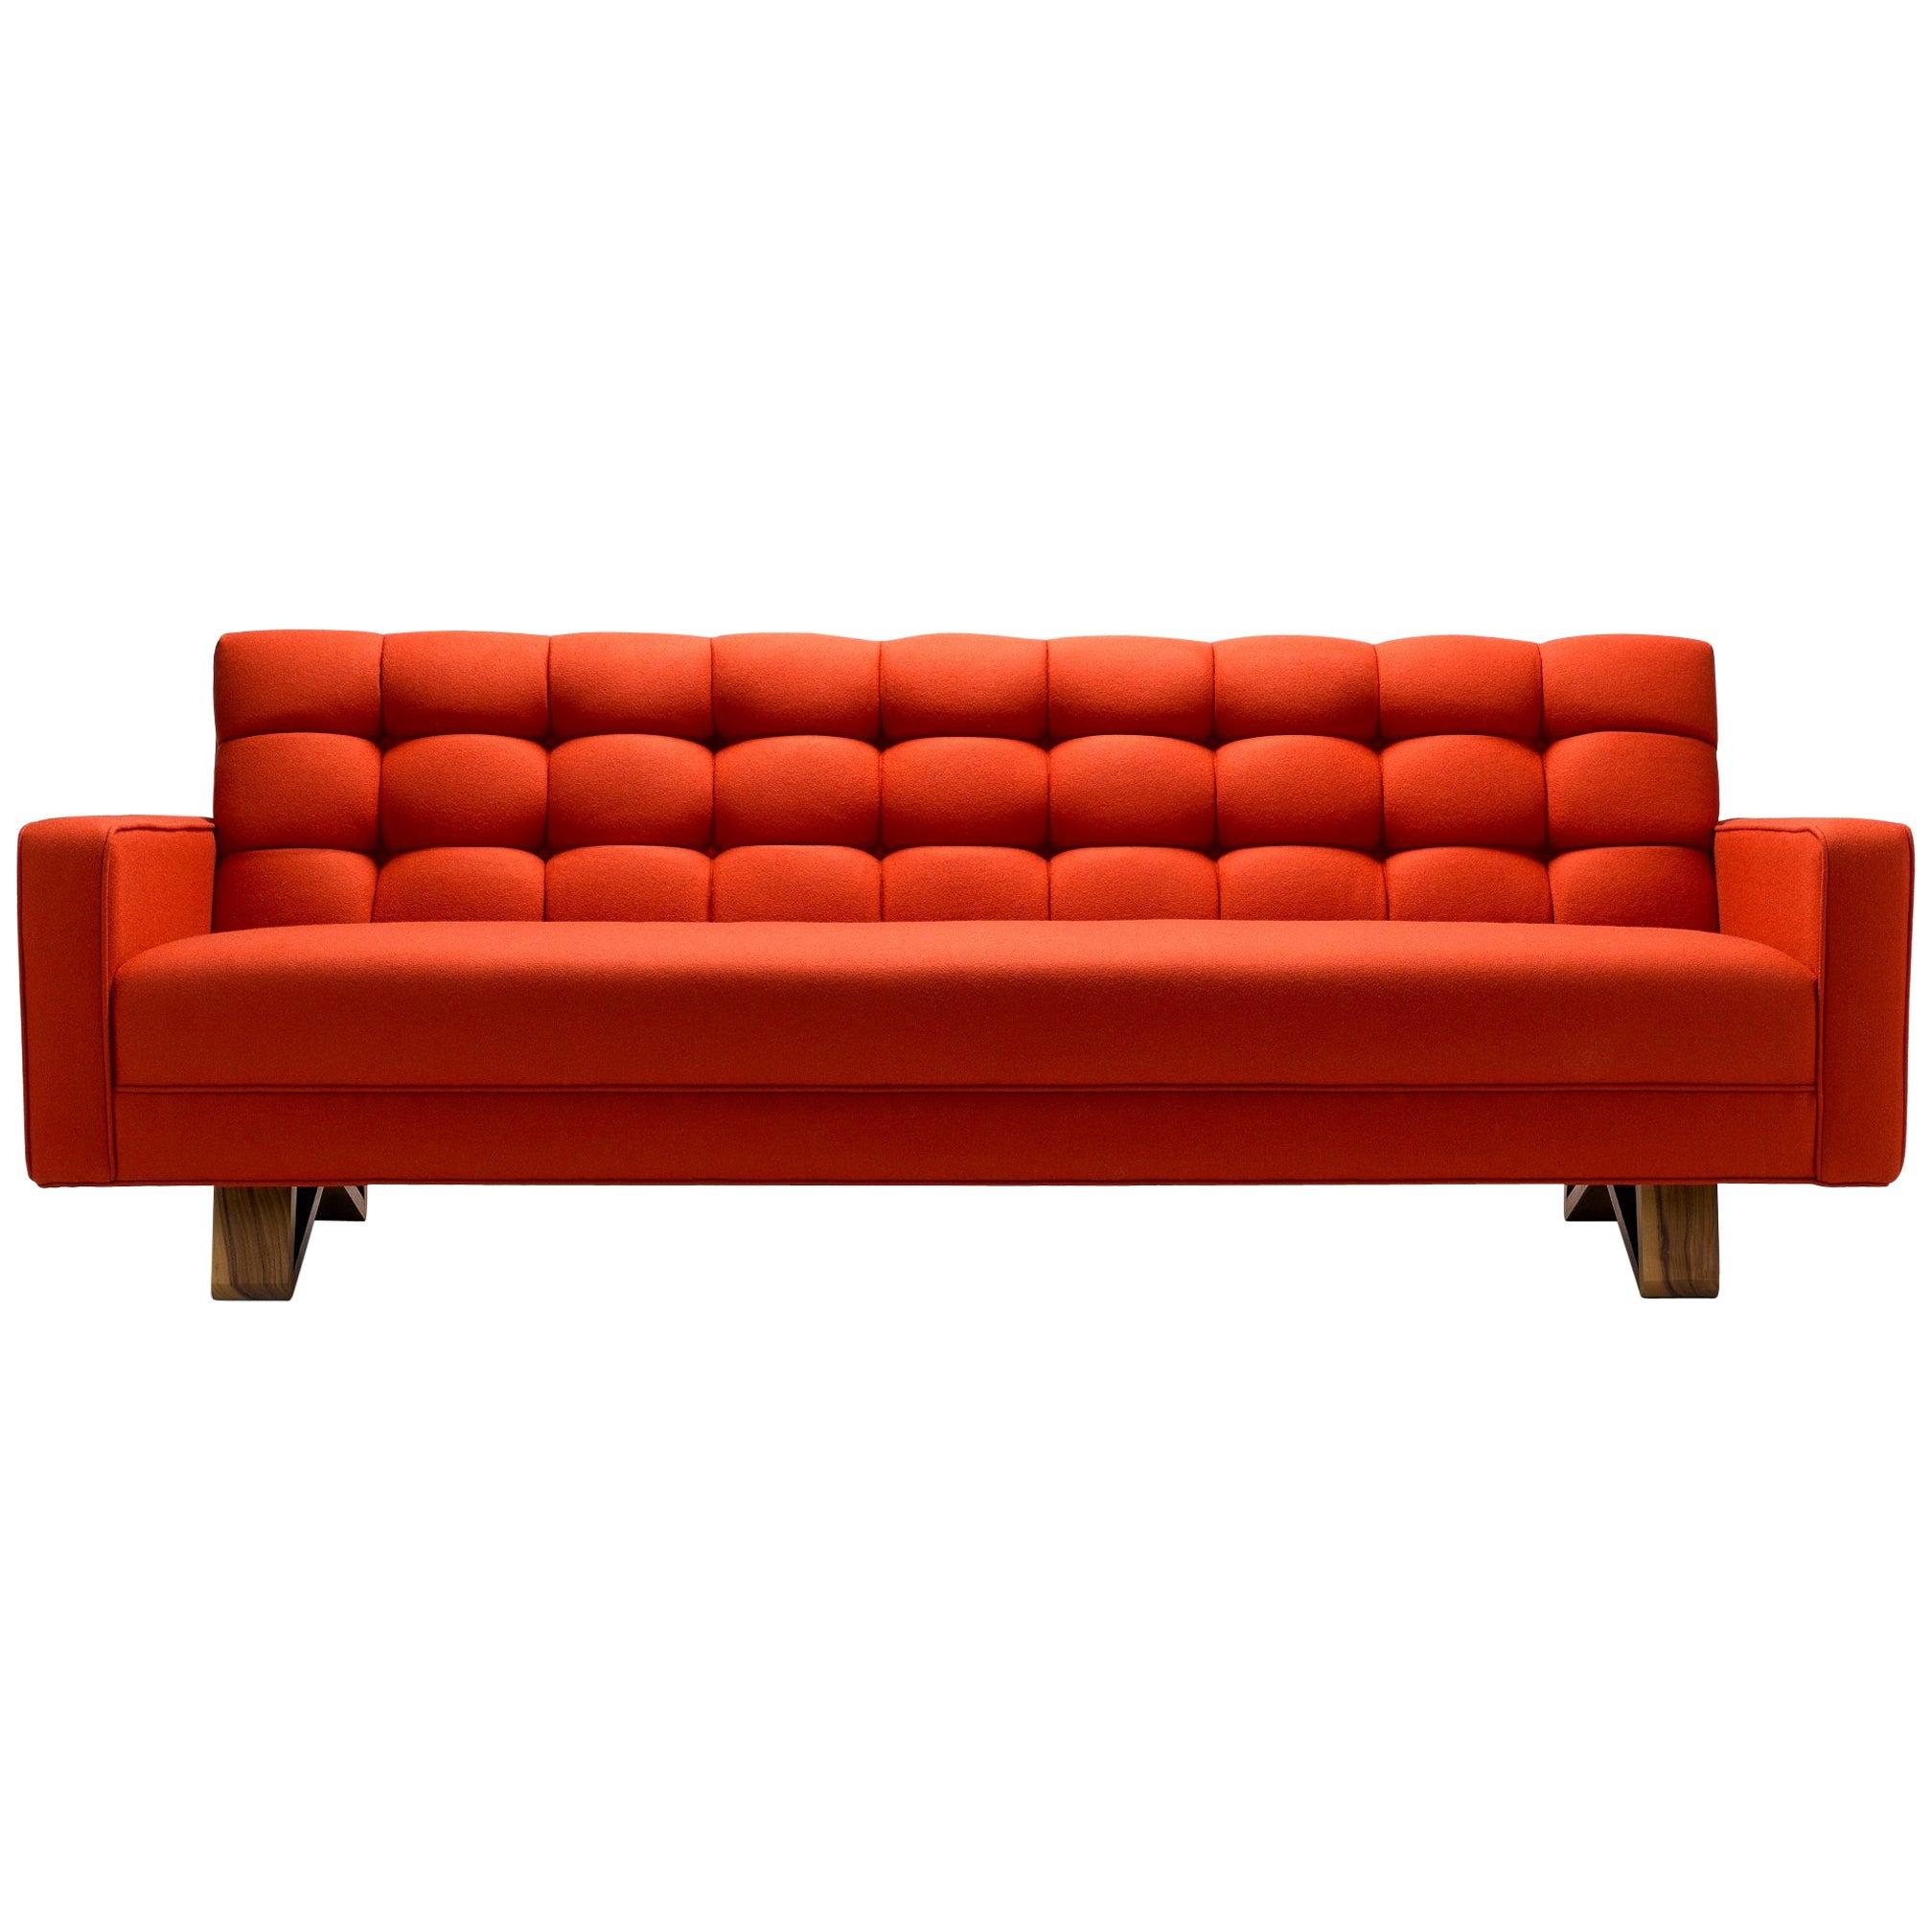 Contemporary Adoni Sofa in Moon Melton Wool with Legs in Walnut or Oak